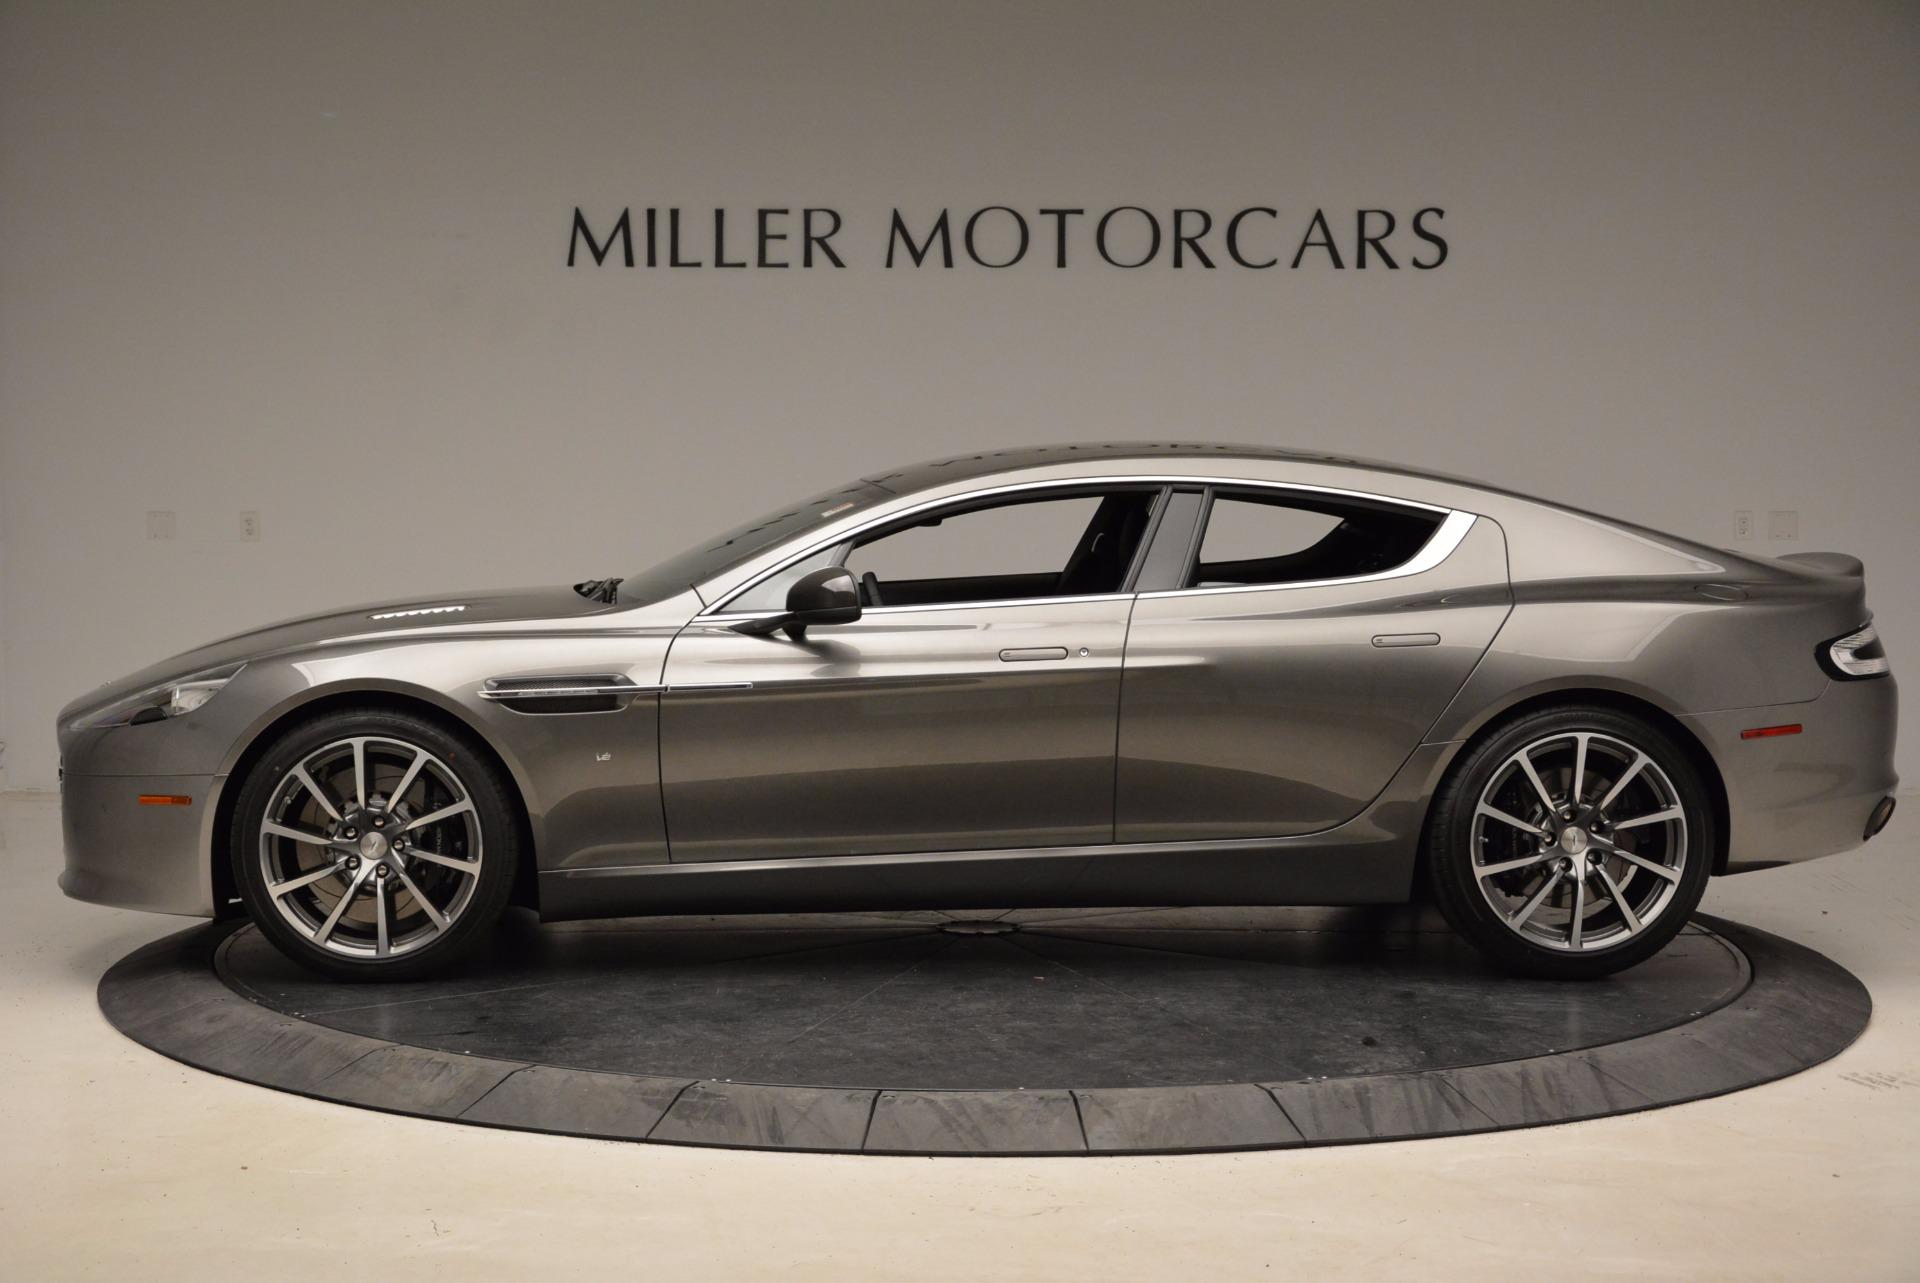 Used 2017 Aston Martin Rapide S Sedan For Sale In Greenwich, CT 1843_p3